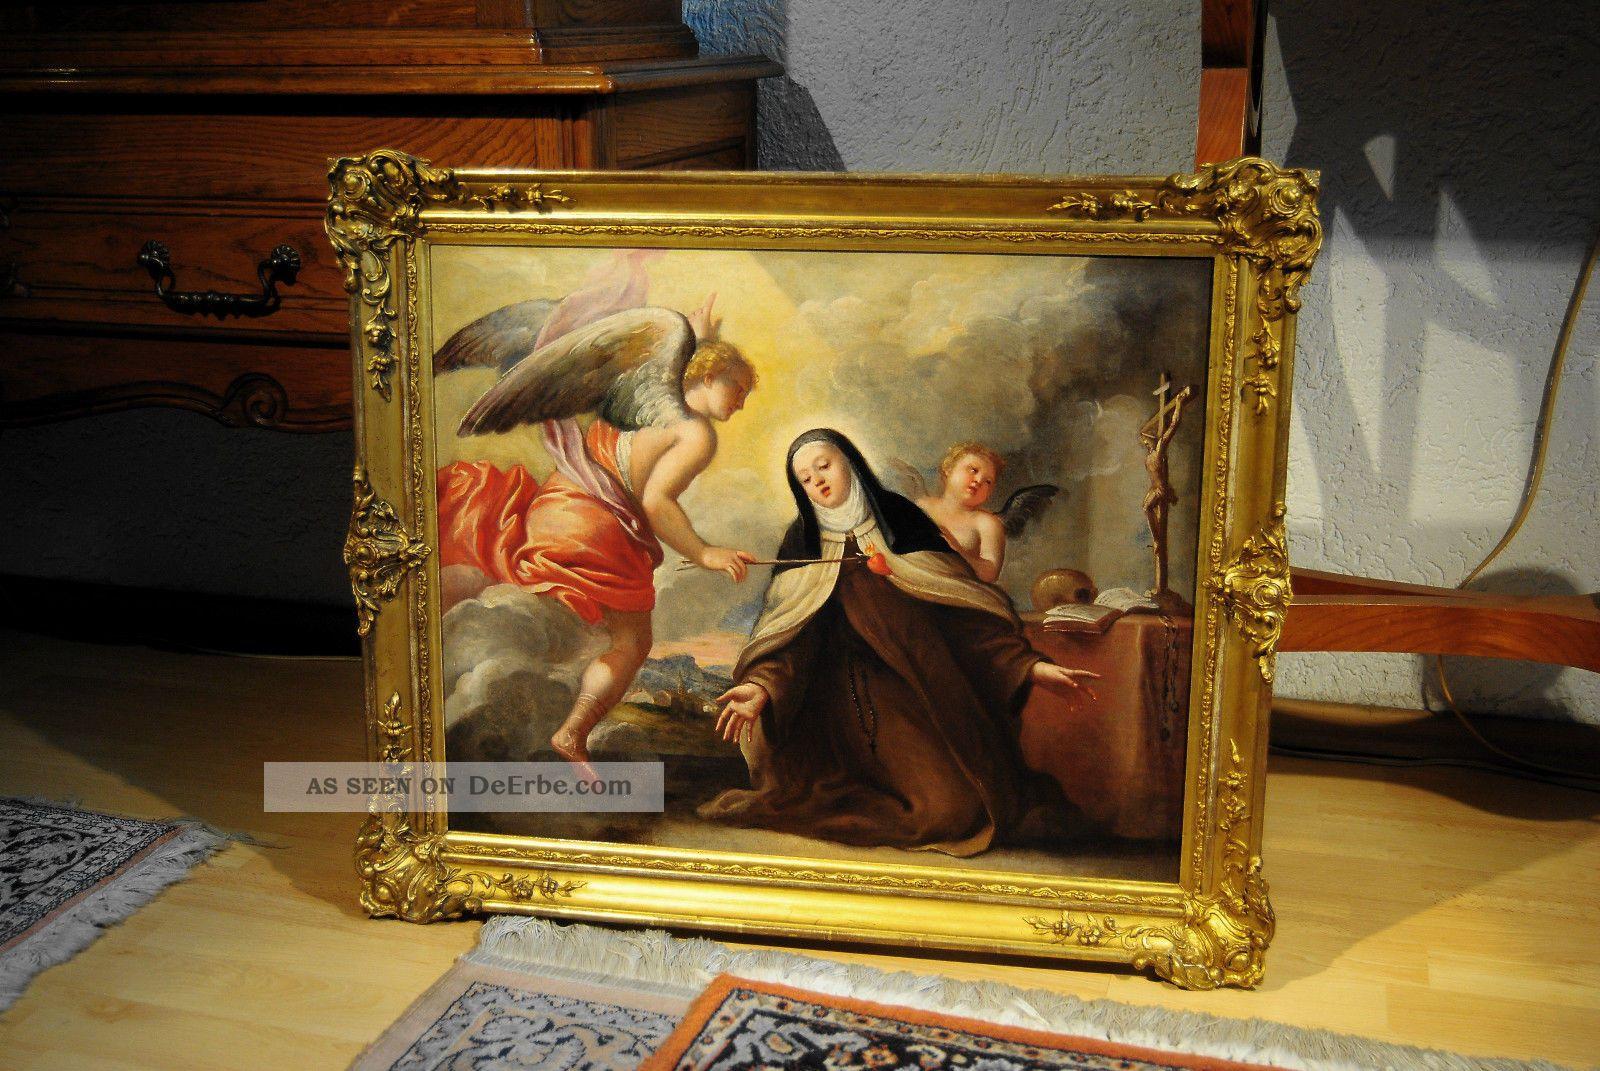 Top gem lde italien heilige teresa von avila 18 jh - Teresa von avila zitate ...